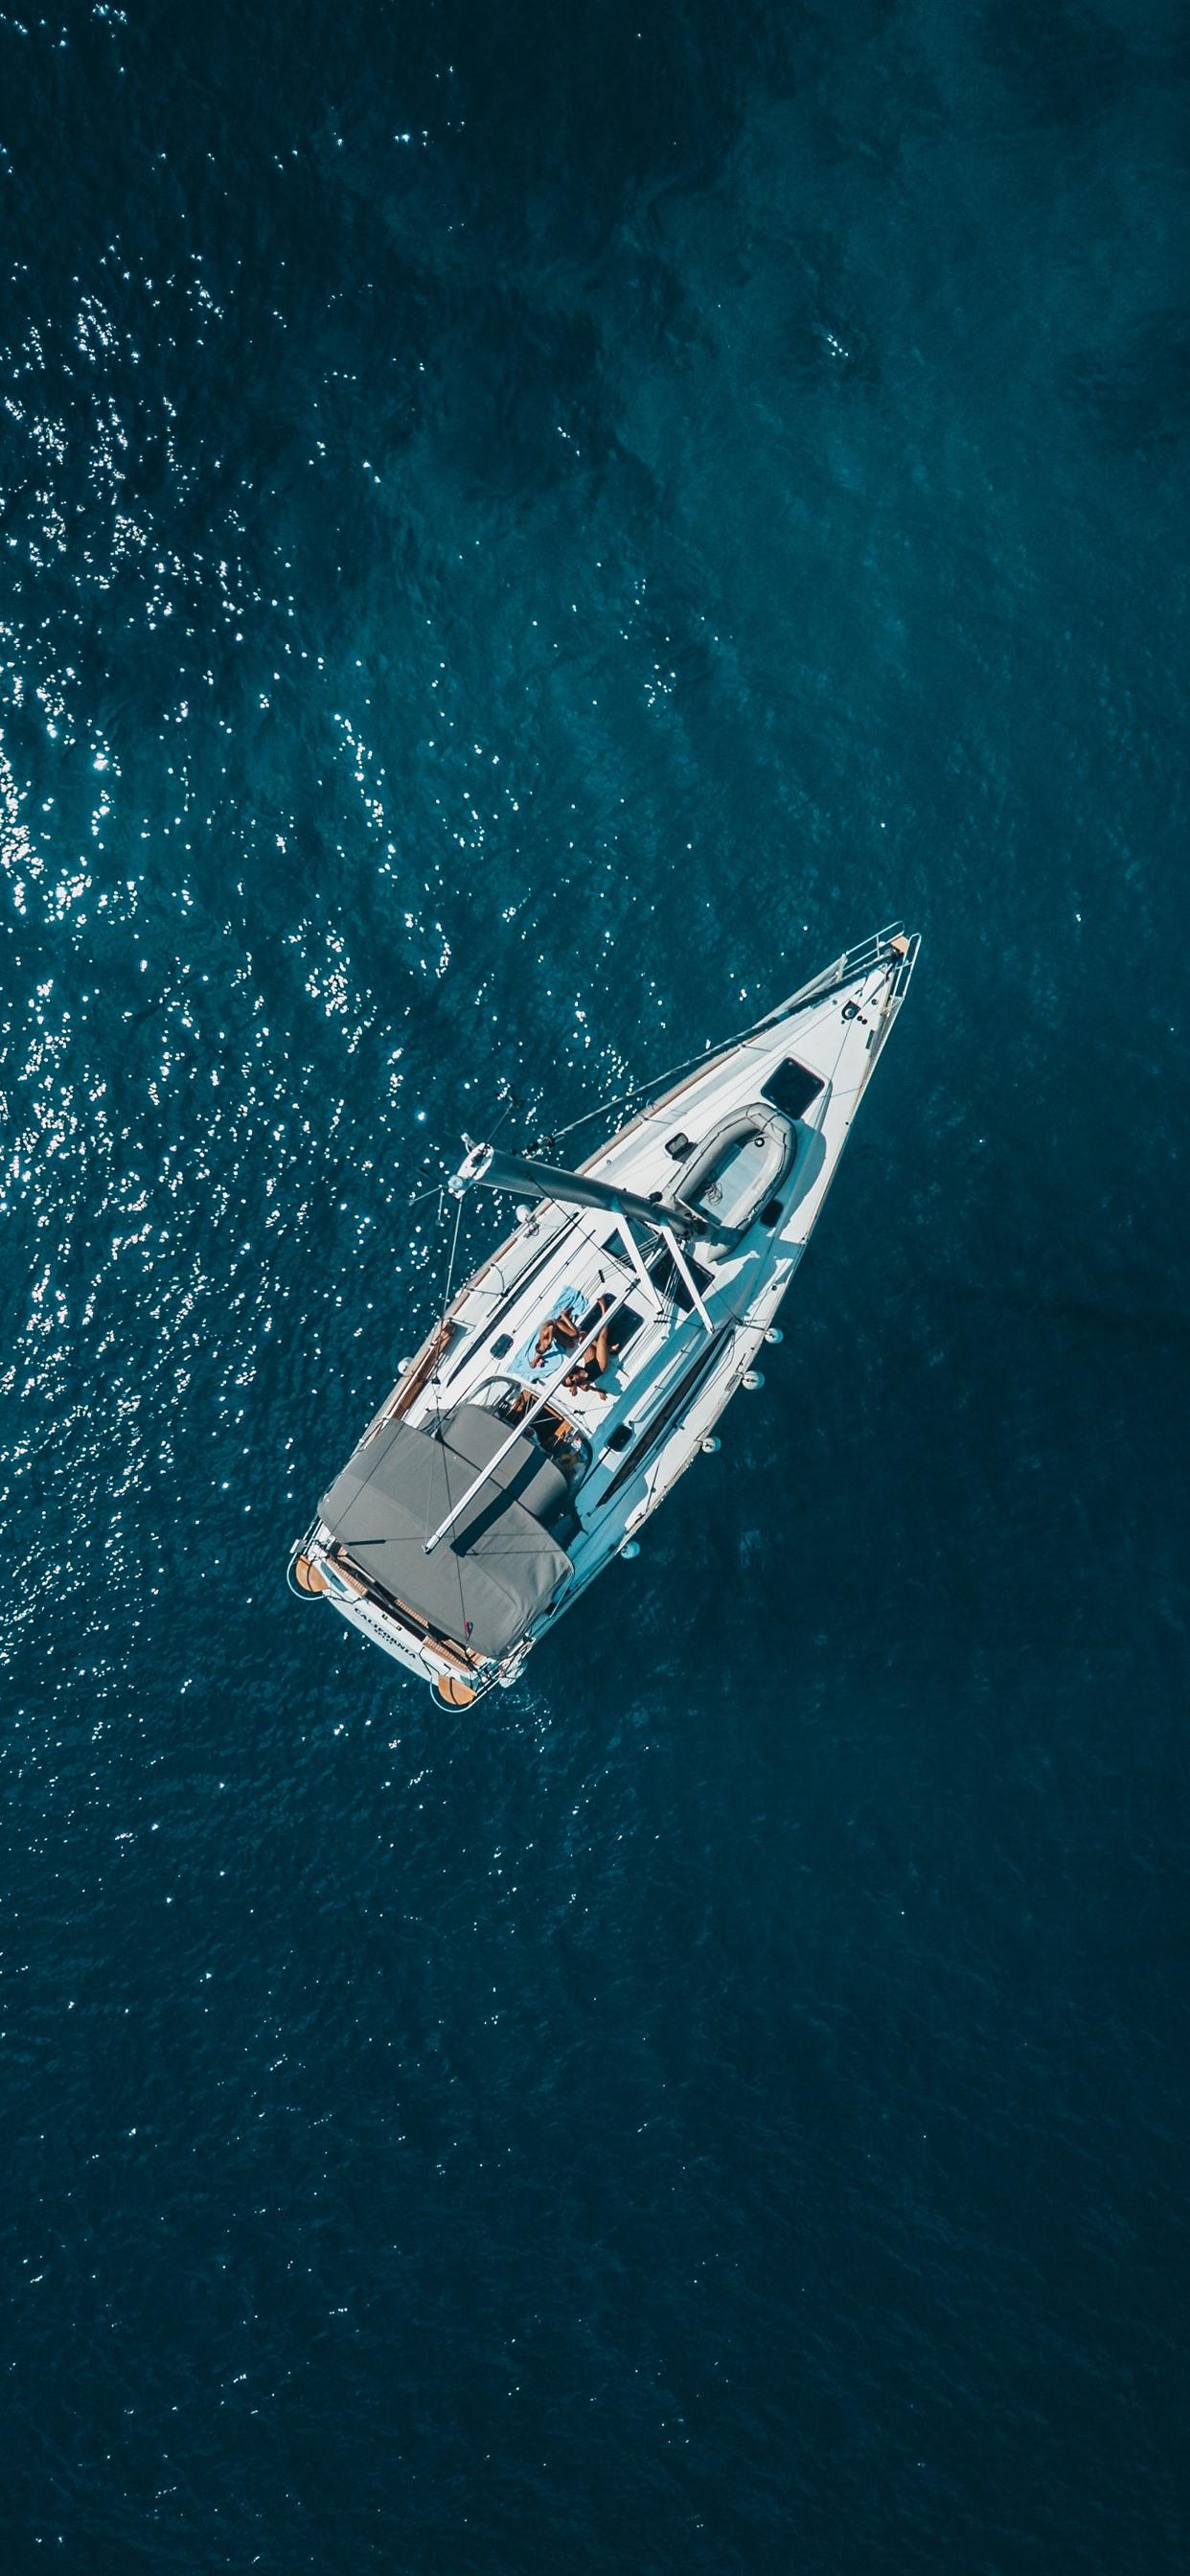 Boat Sea Top View 1242x2688 Iphone Xs Max Wallpaper